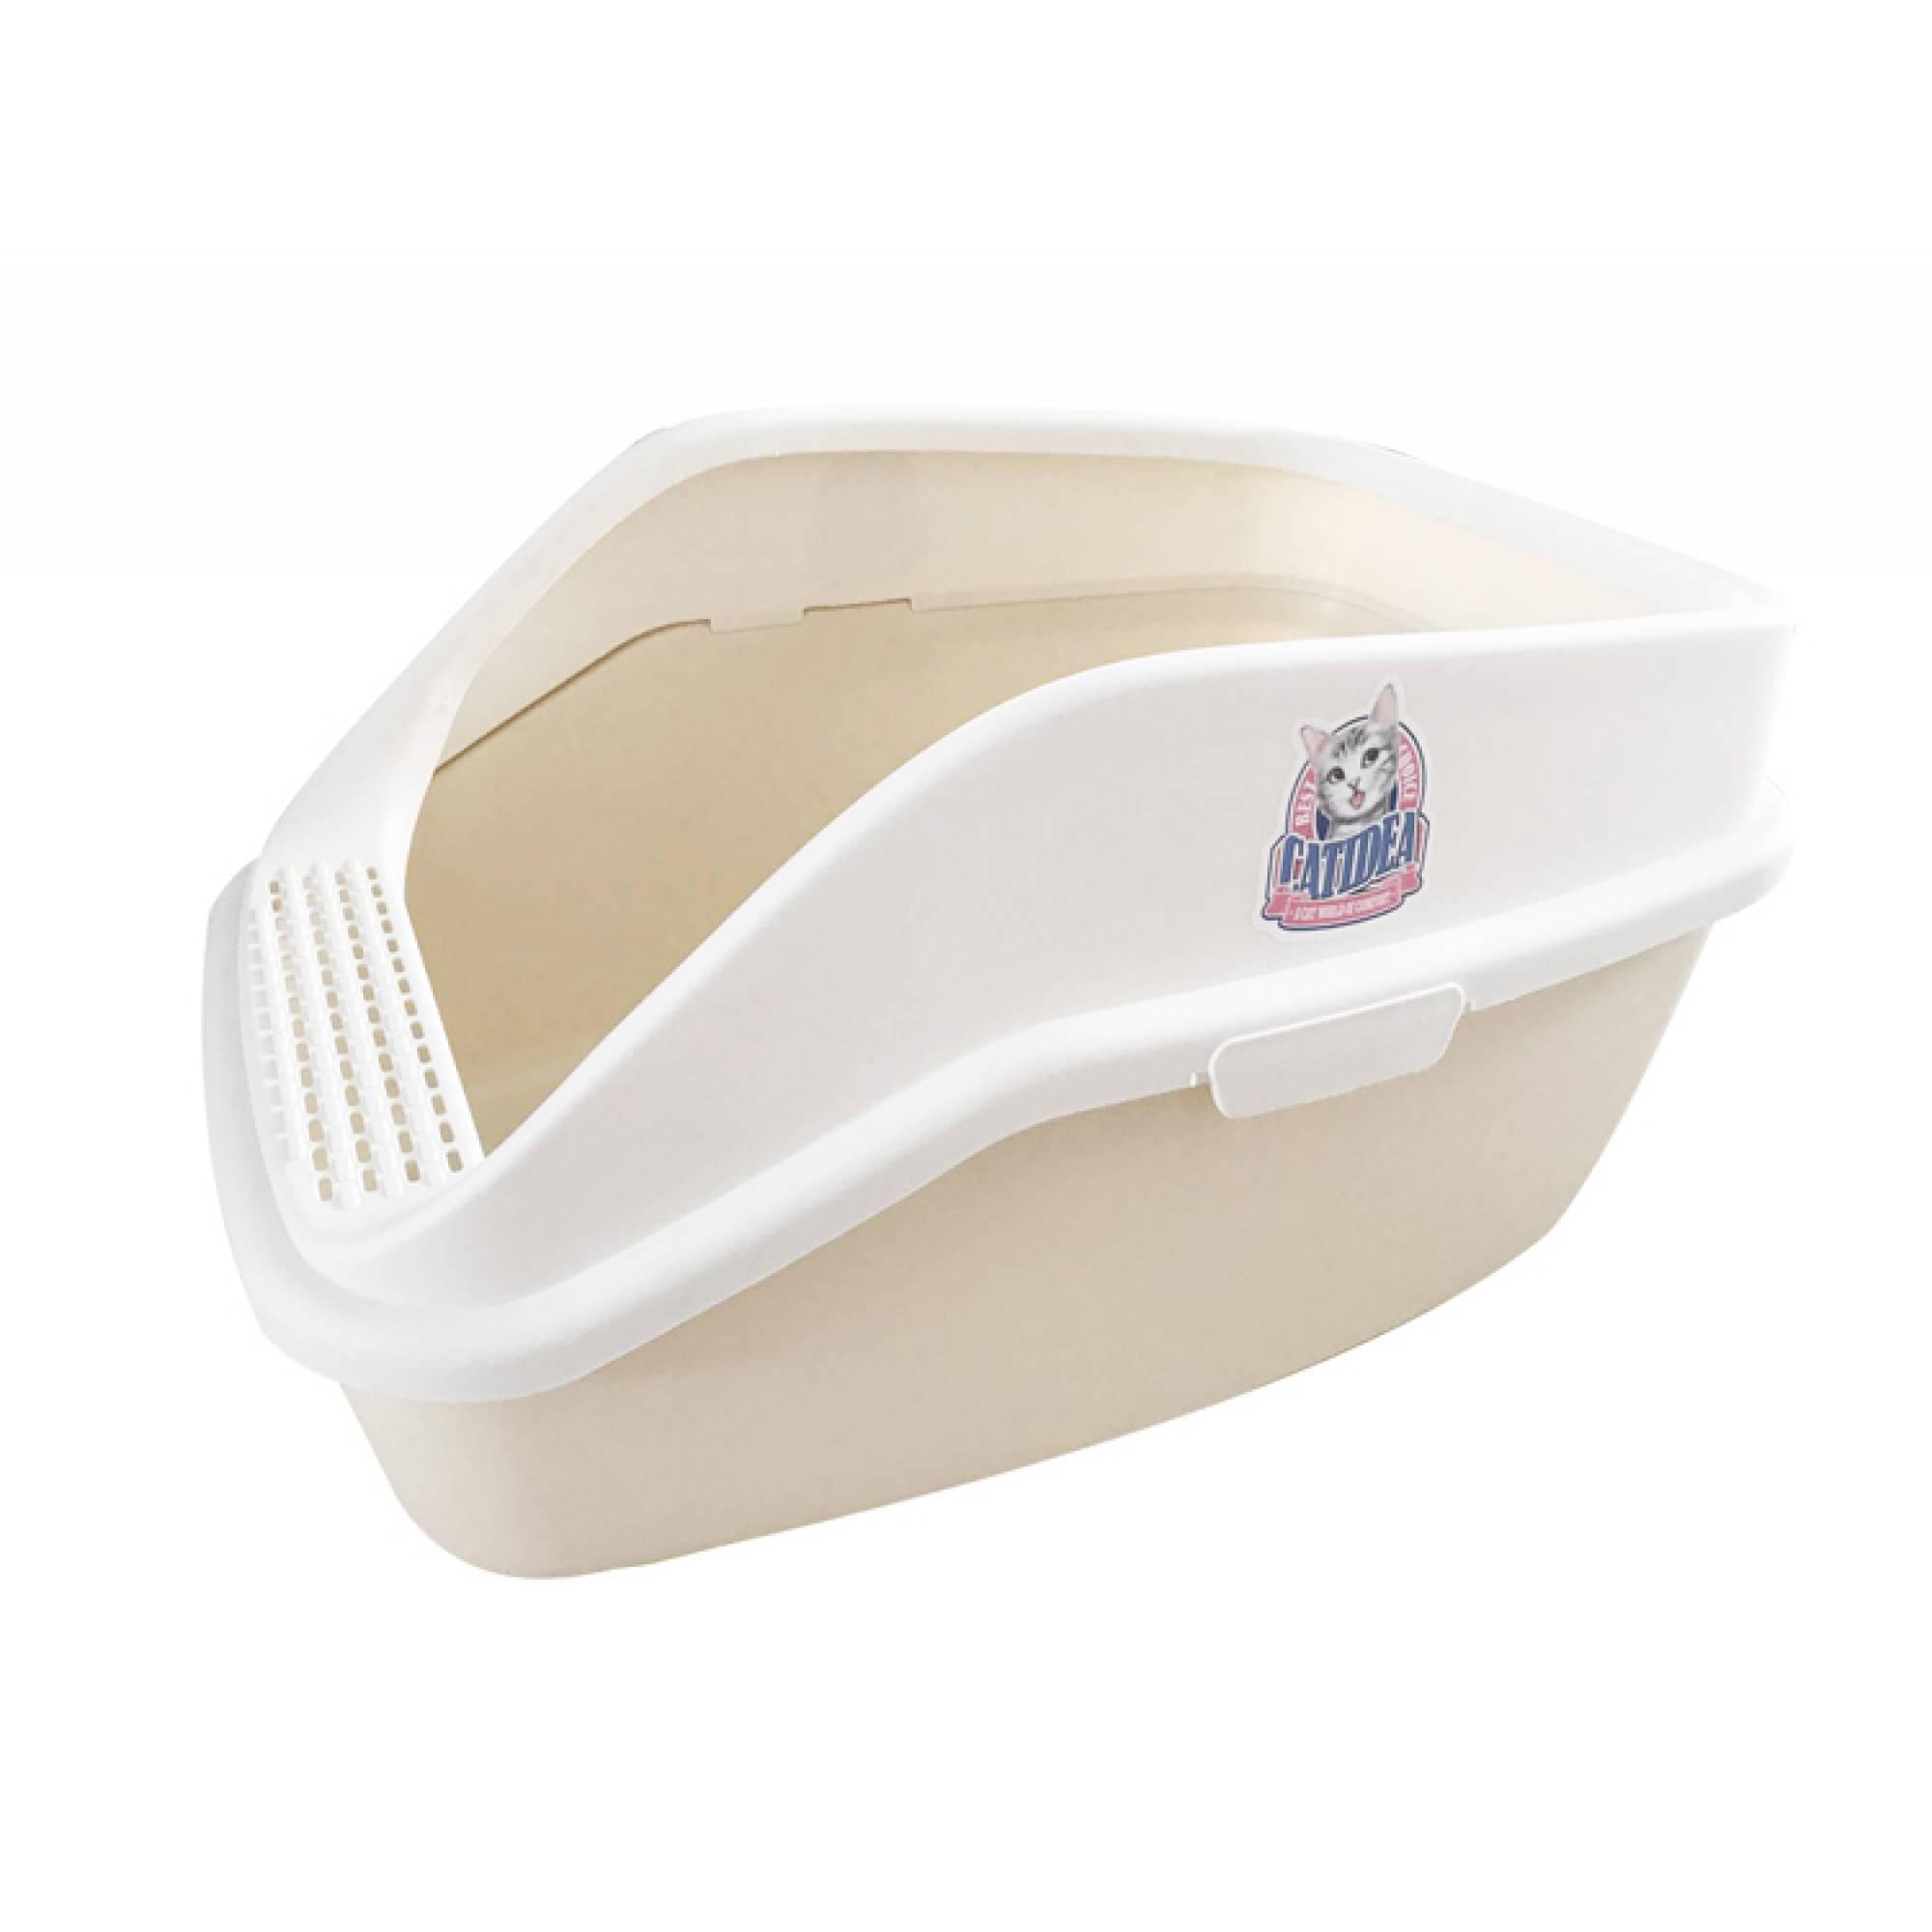 CATIDEA - CL221 Luxury Shark Cat Litter Box - Cream